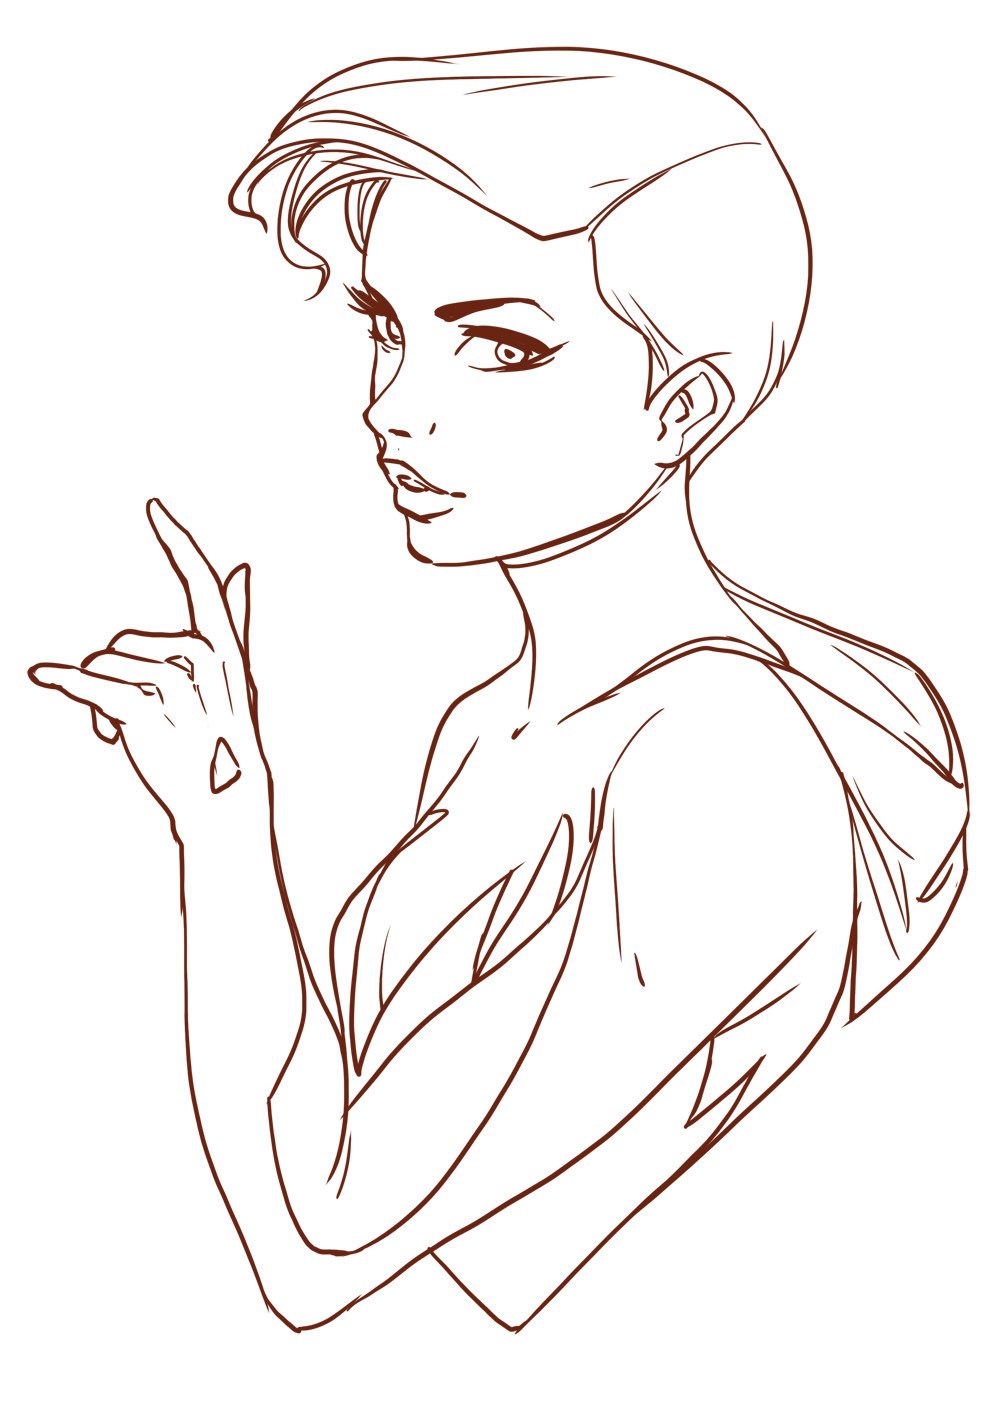 Heri irawan torso spider woman b